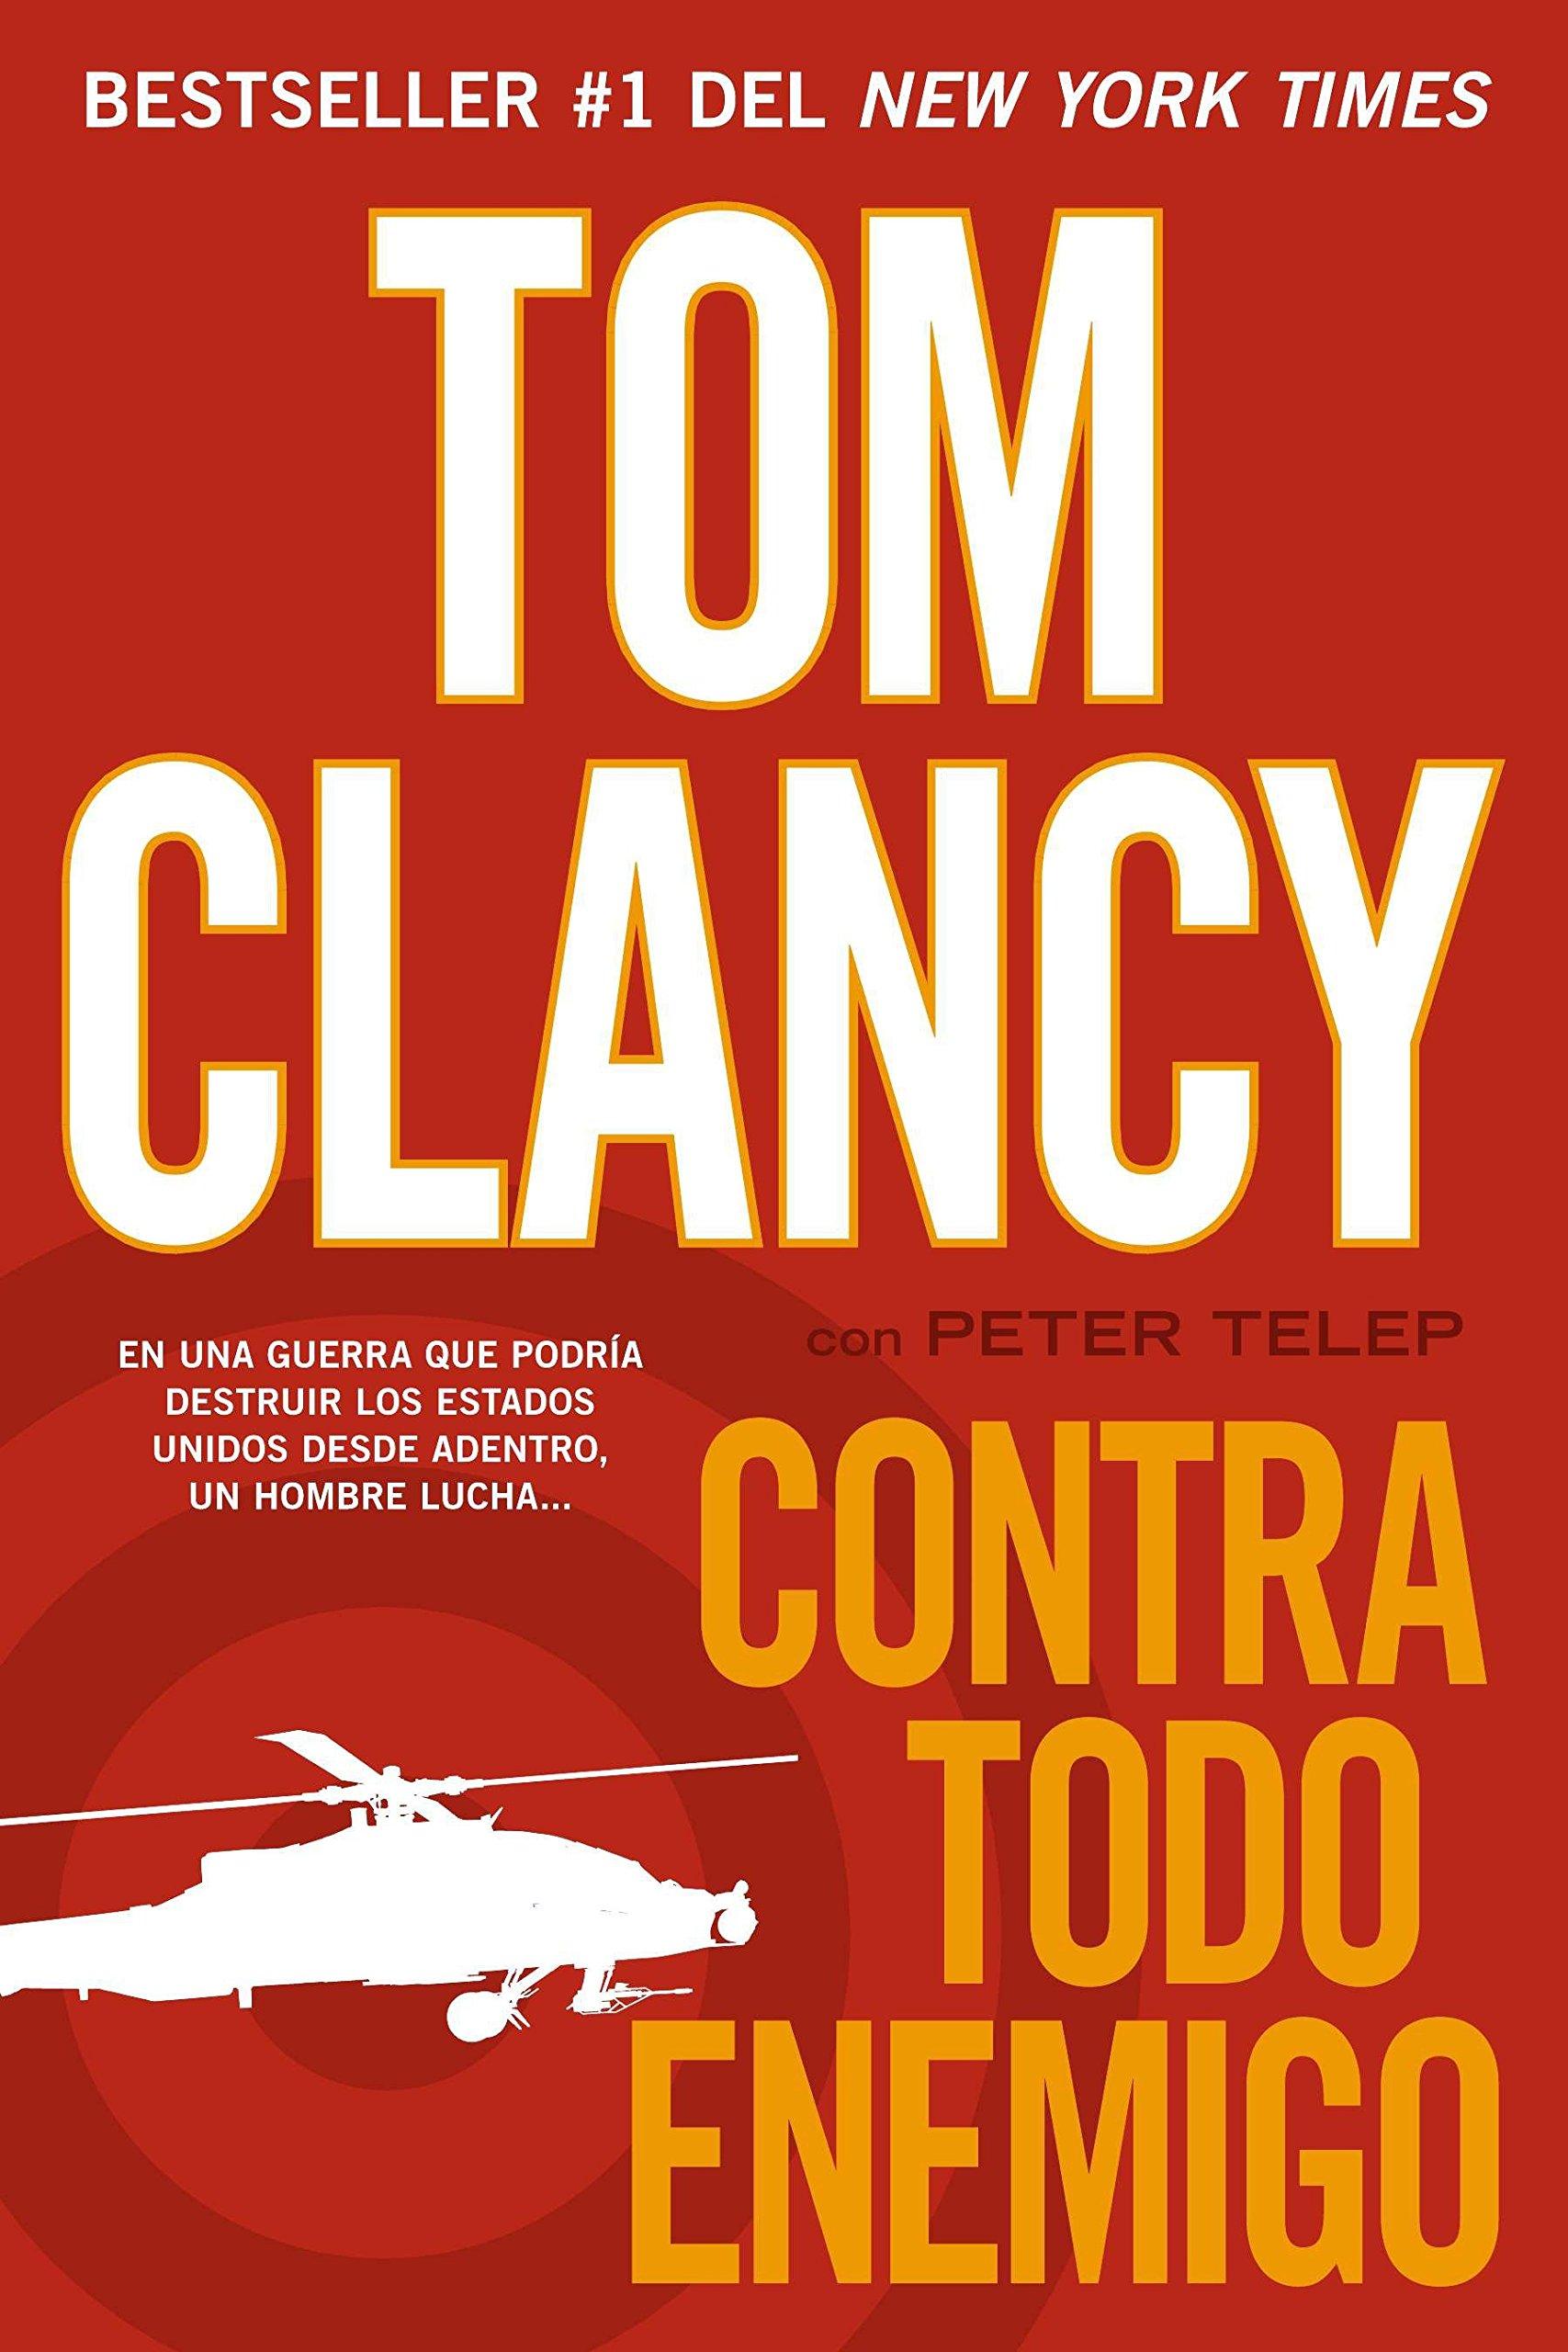 Contra Todo Enemigo Tapa blanda – 31 dic 2012 Tom Clancy Peter Telep CELEBRA 0451416422